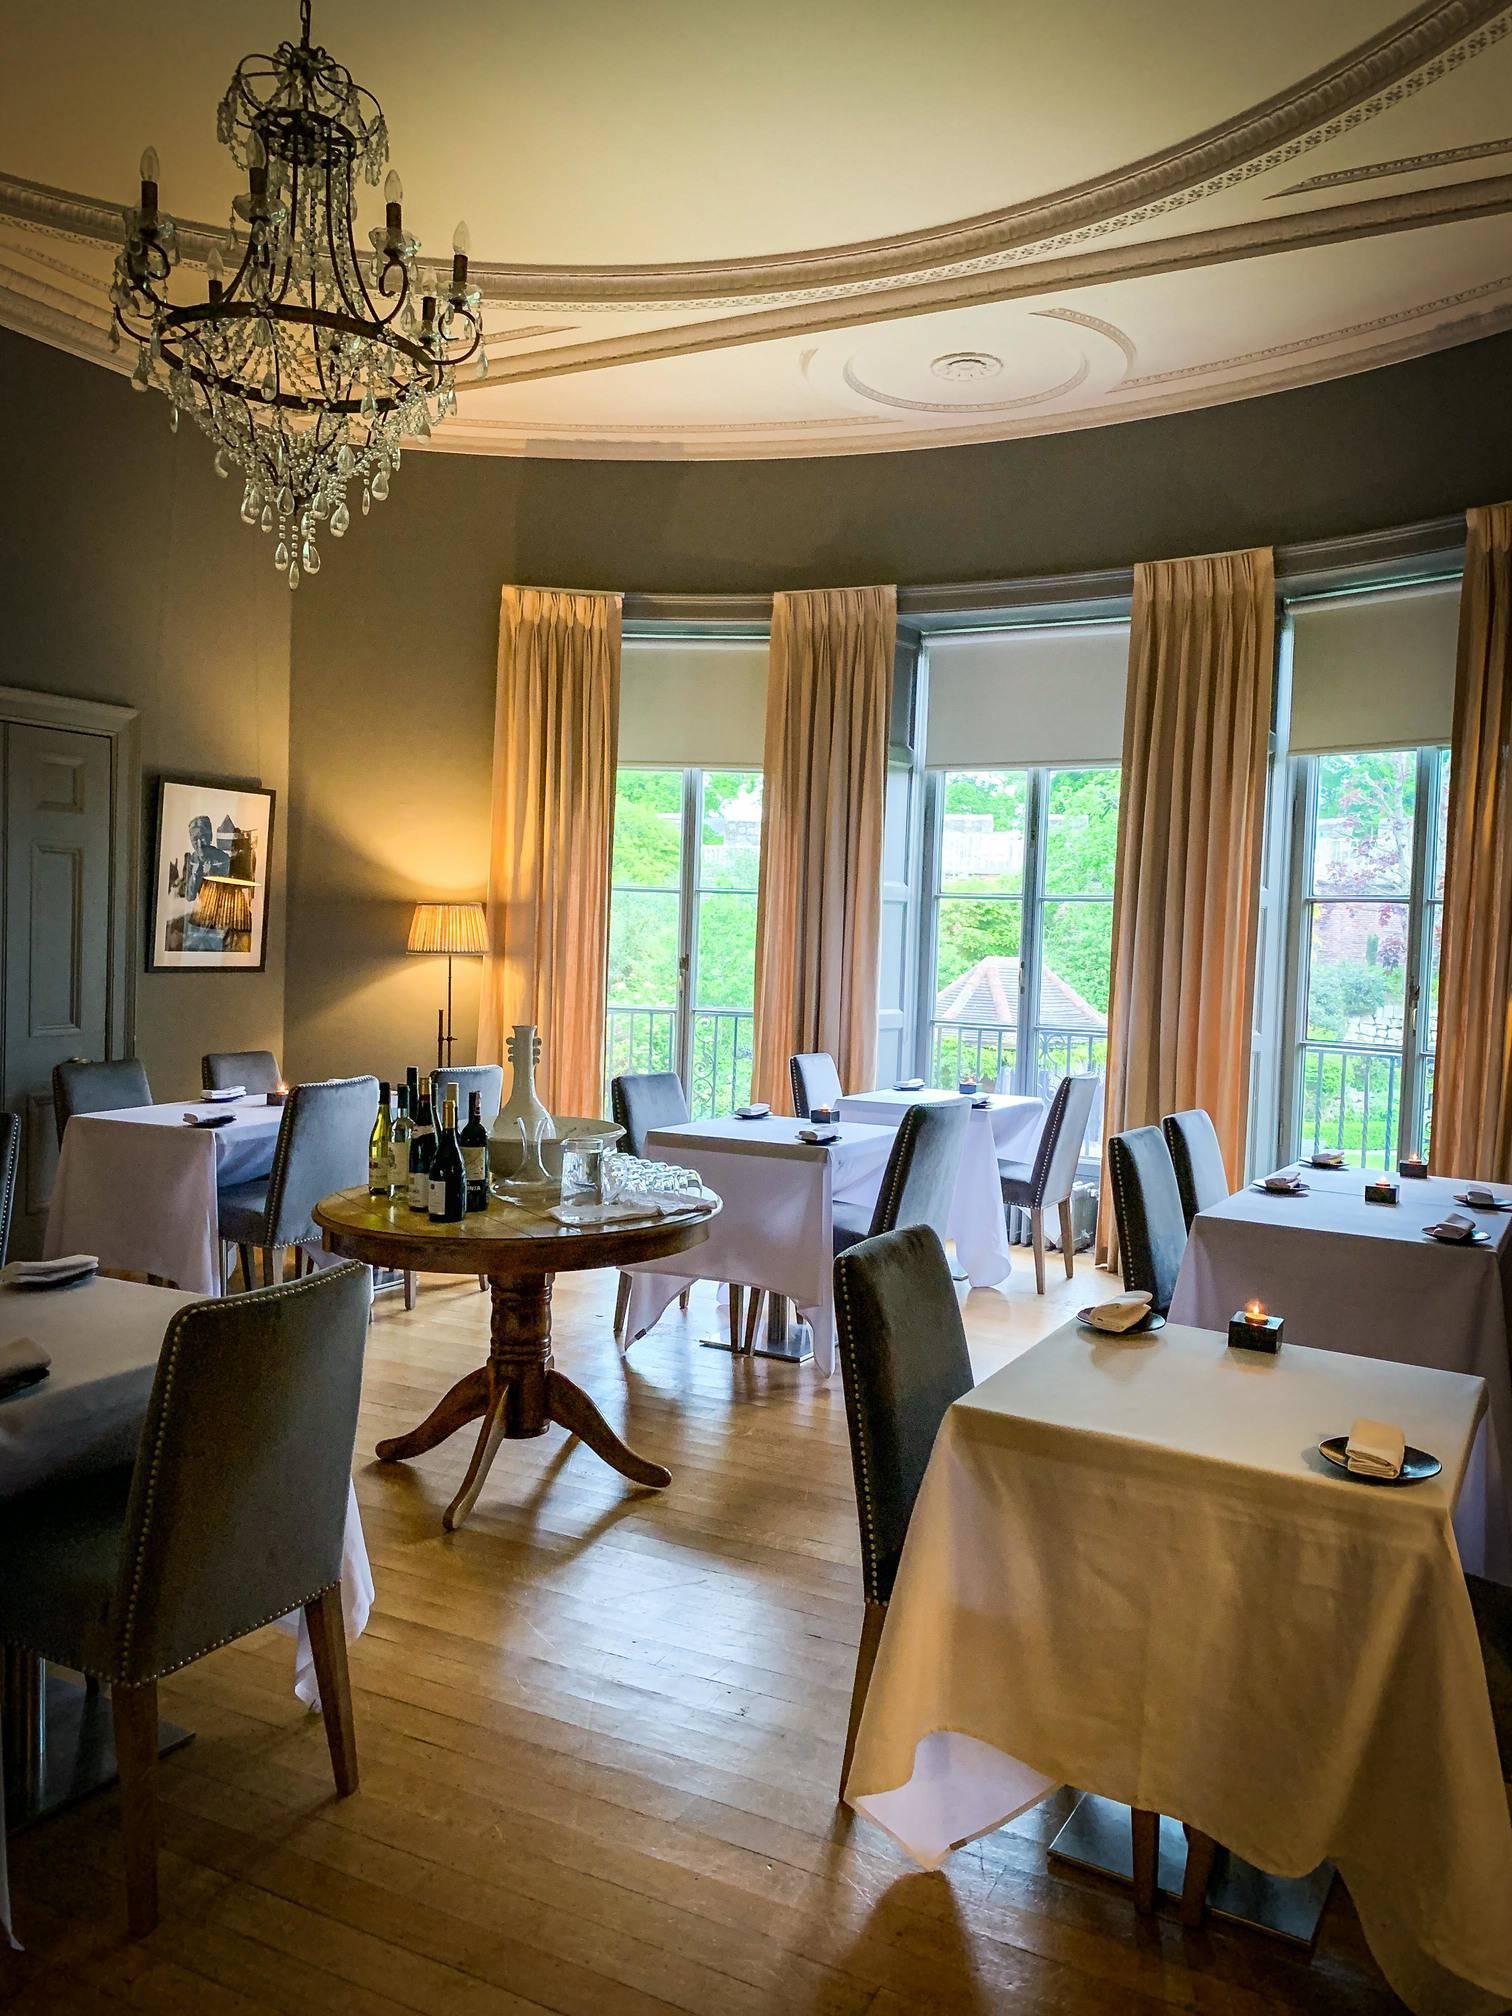 Restaurant interior. Bow Room Restaurant at Grays Court York